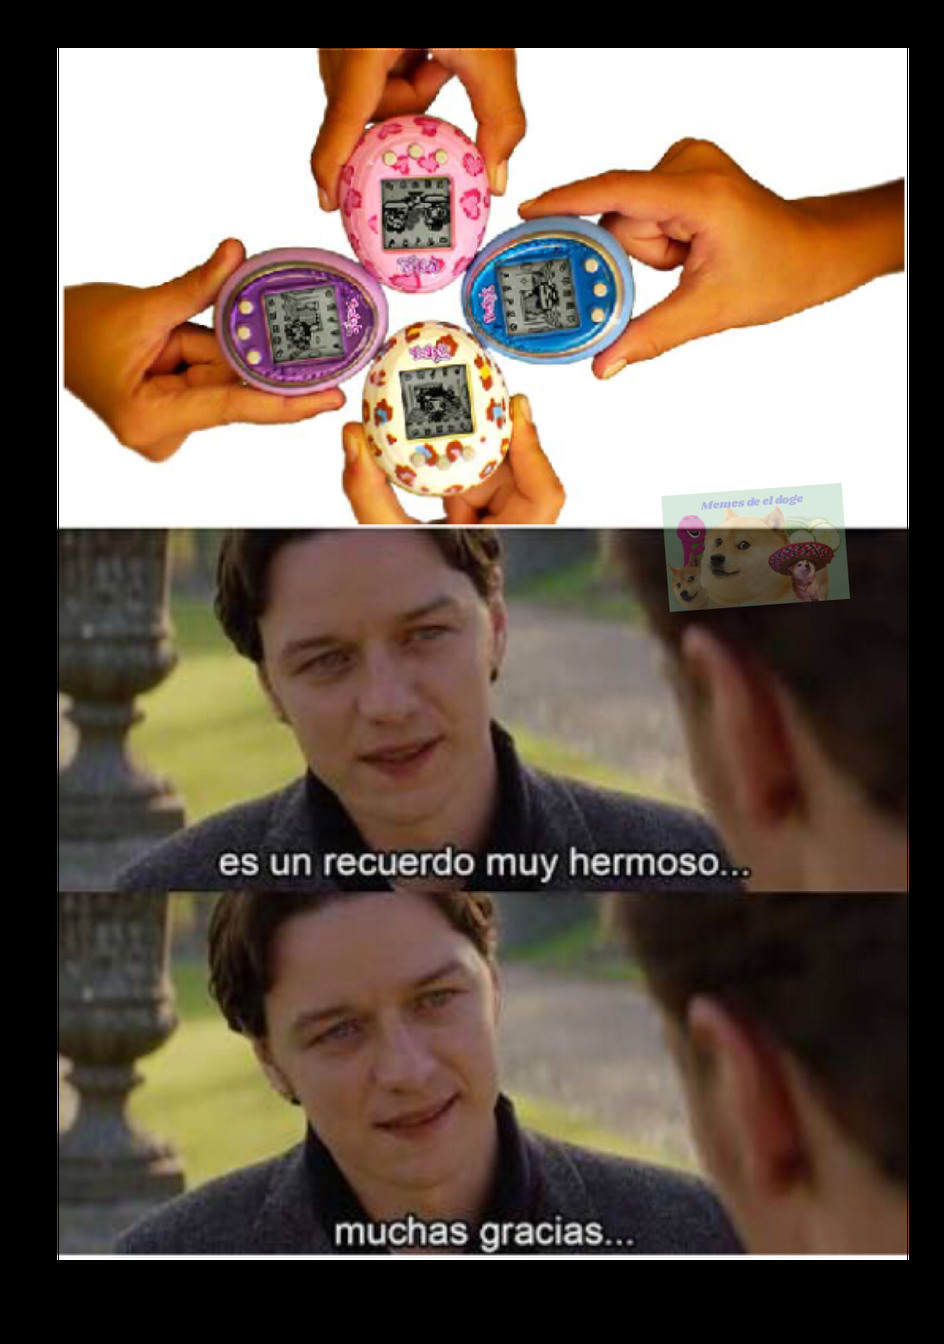 Los miticos tamagotchis - meme